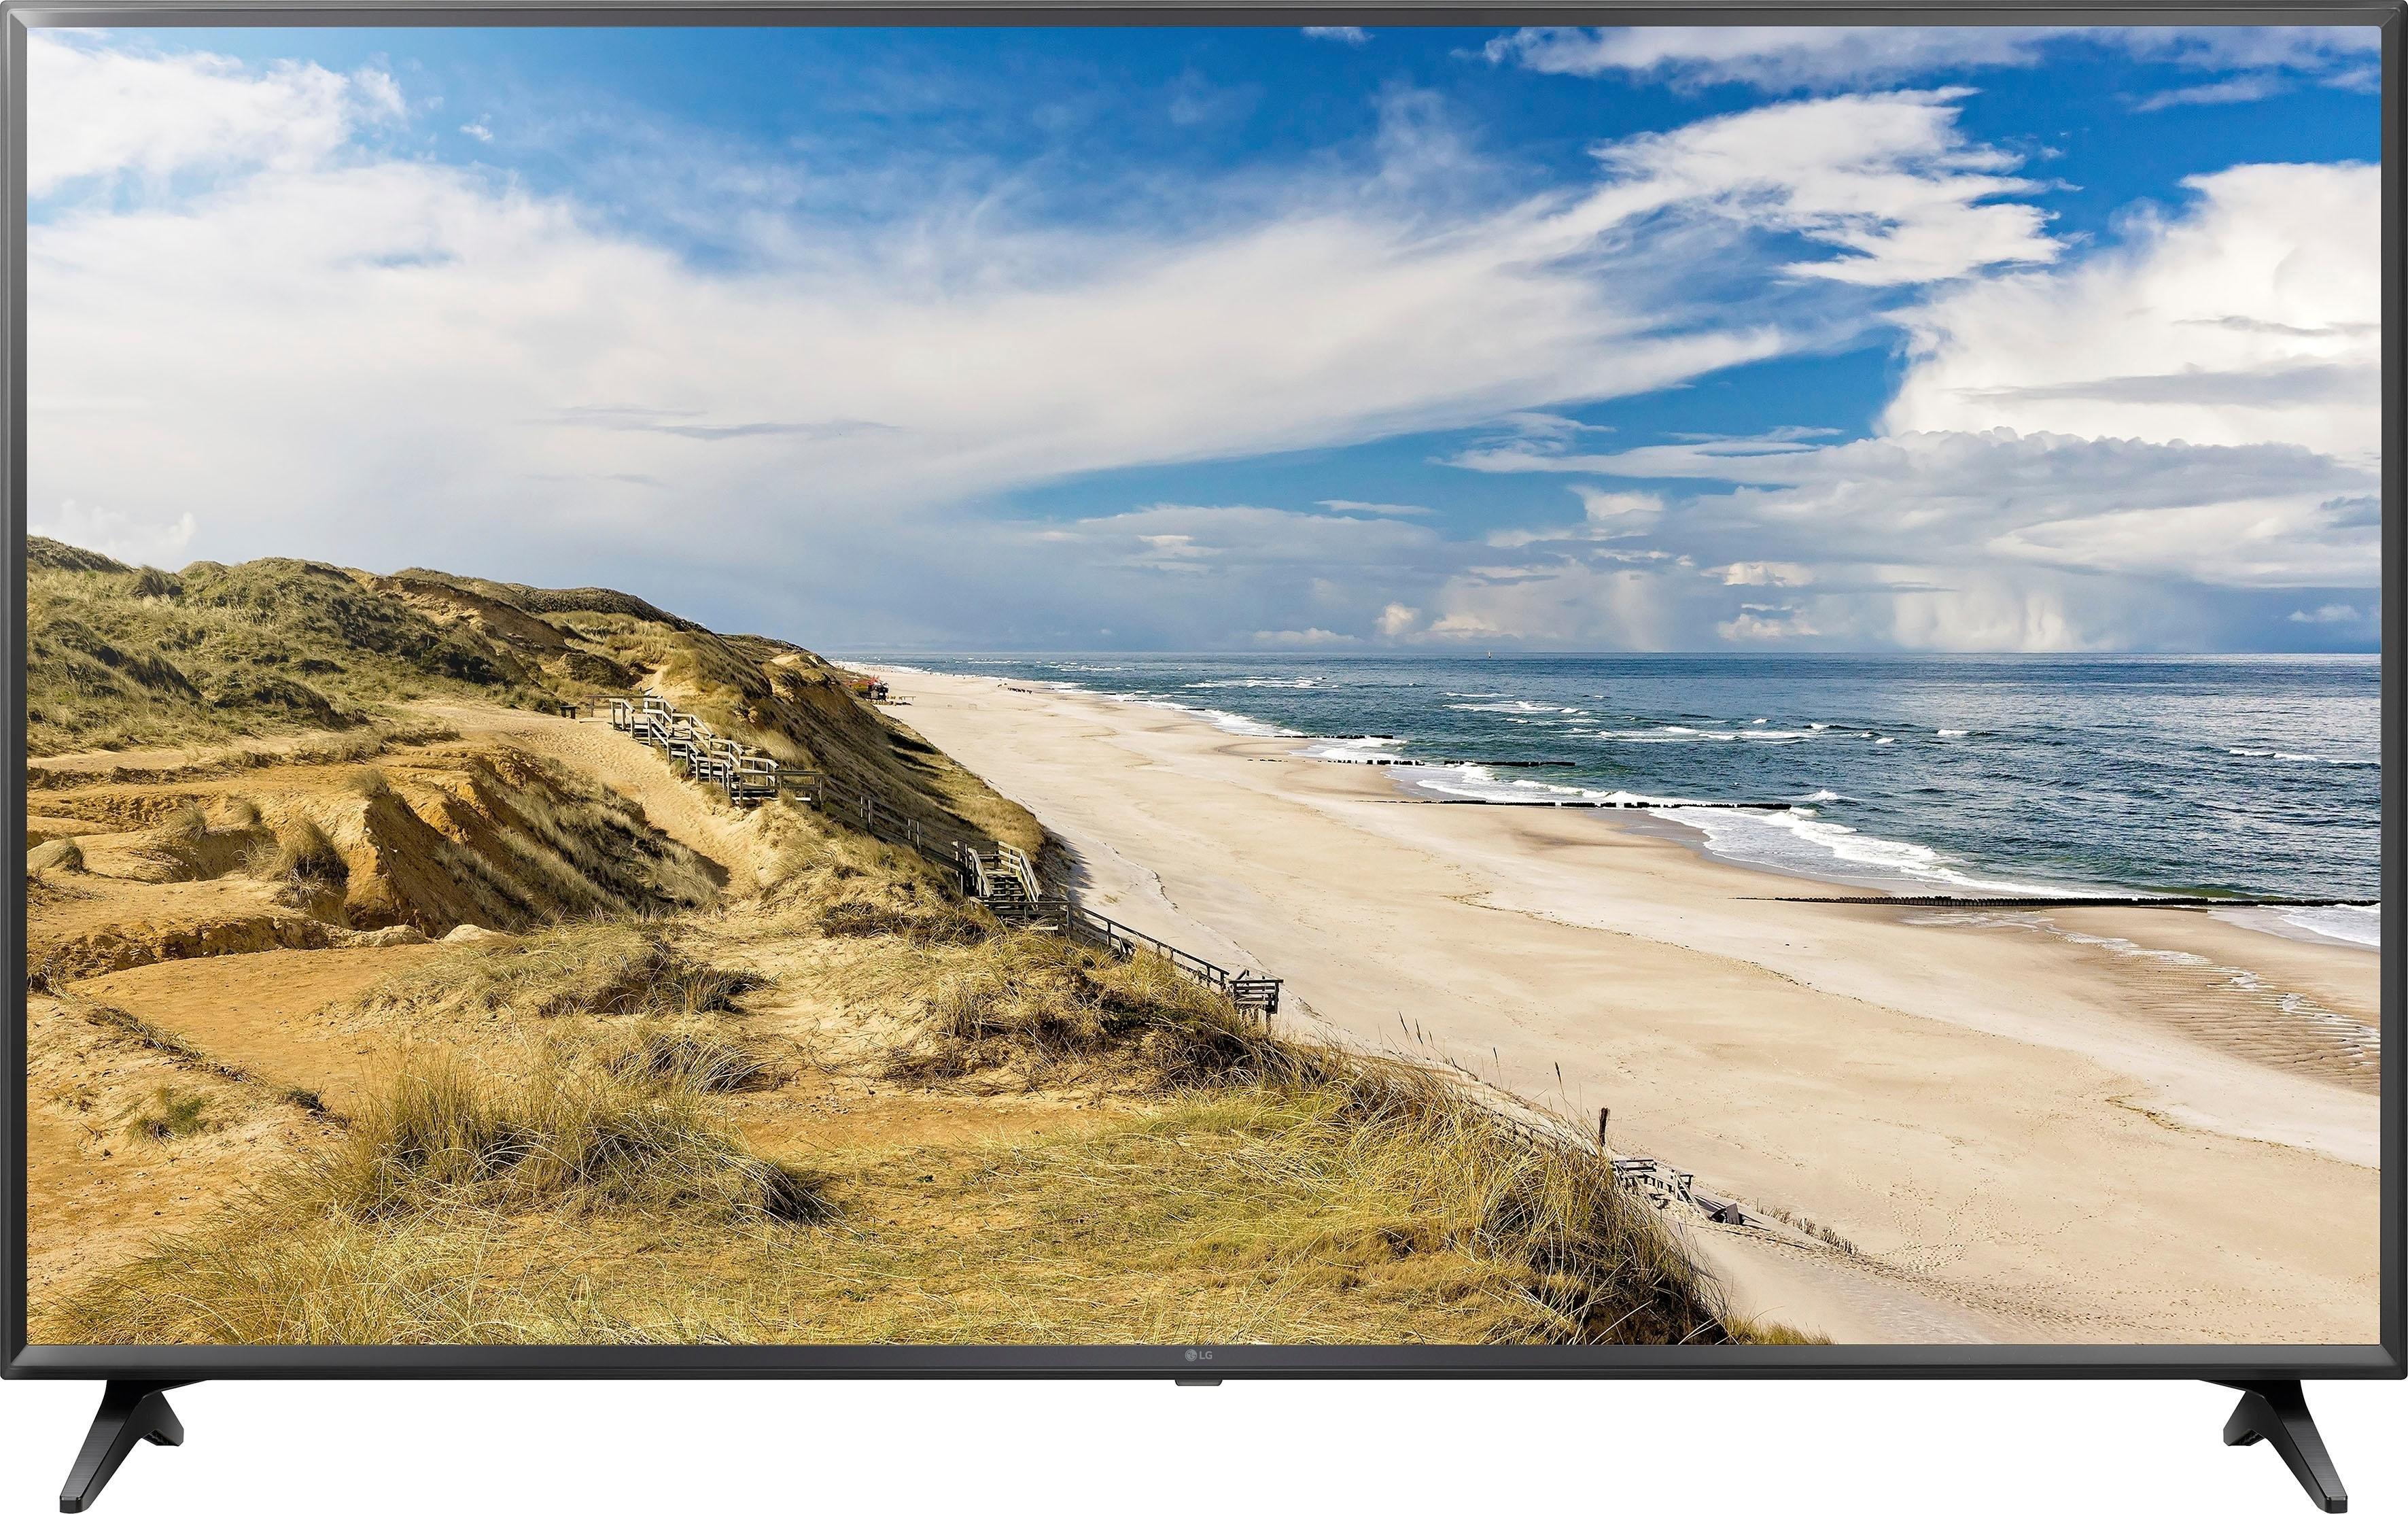 LG 65UM7100PLA led-tv (164 cm / 65 inch), 4K Ultra HD, smart-tv online kopen op otto.nl